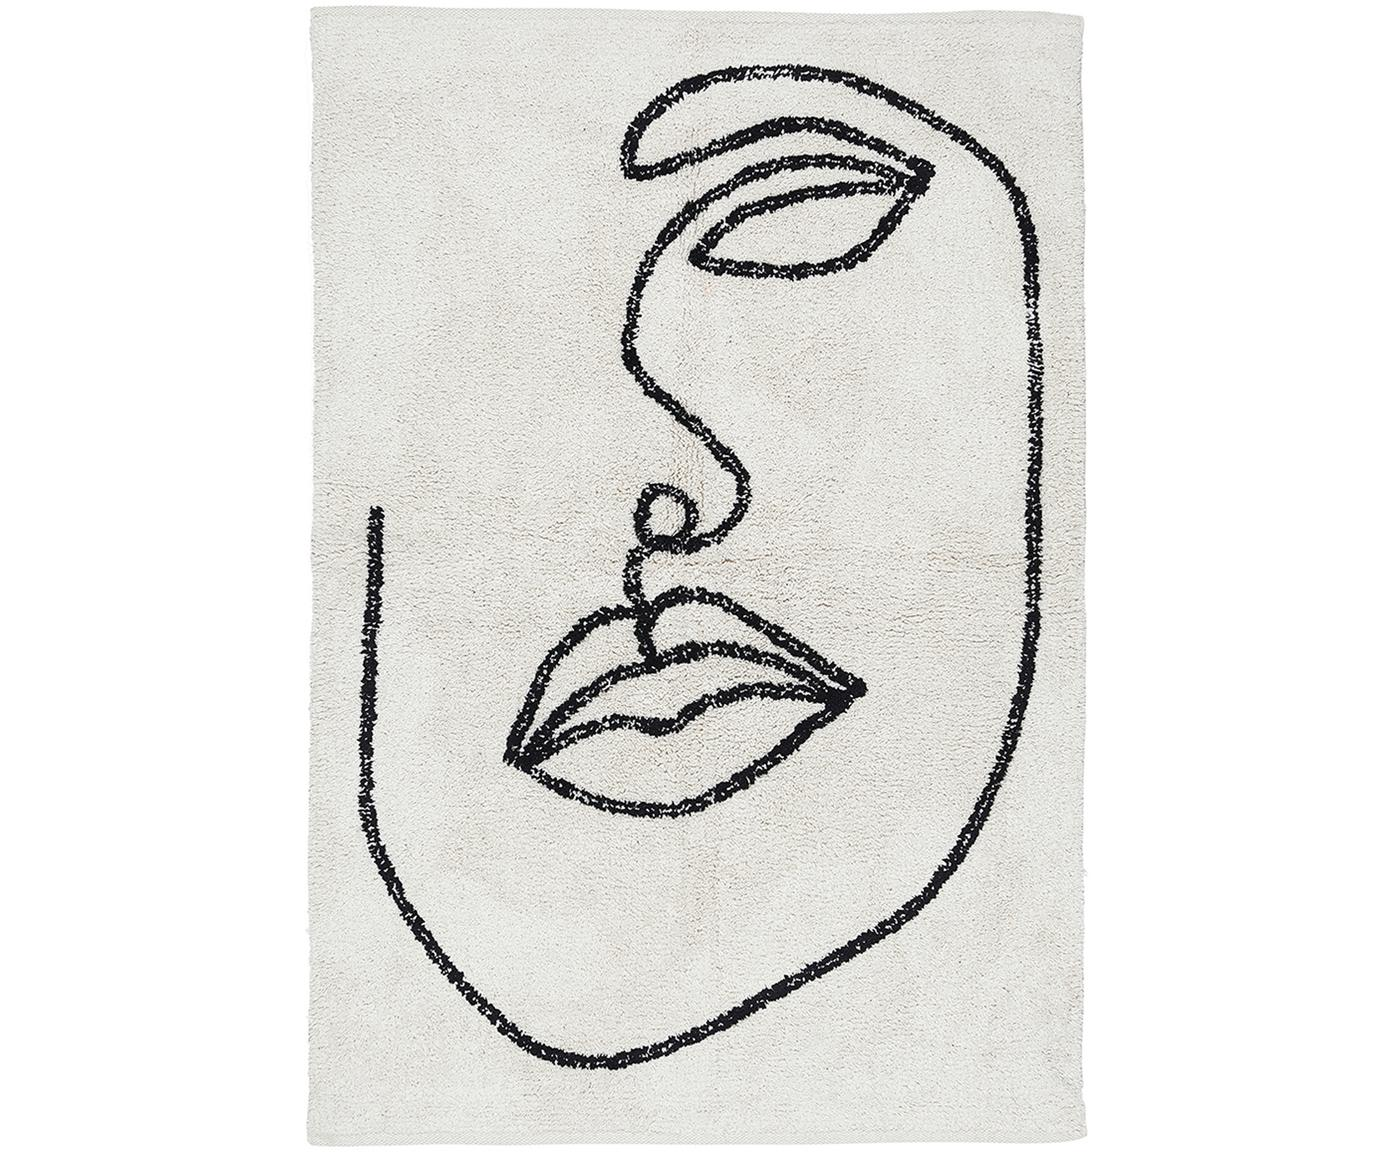 Alfombra de algodón Visage, Algodón ecológico, Blanco crudo, negro, An 90 x L 120 cm (Tamaño XS)